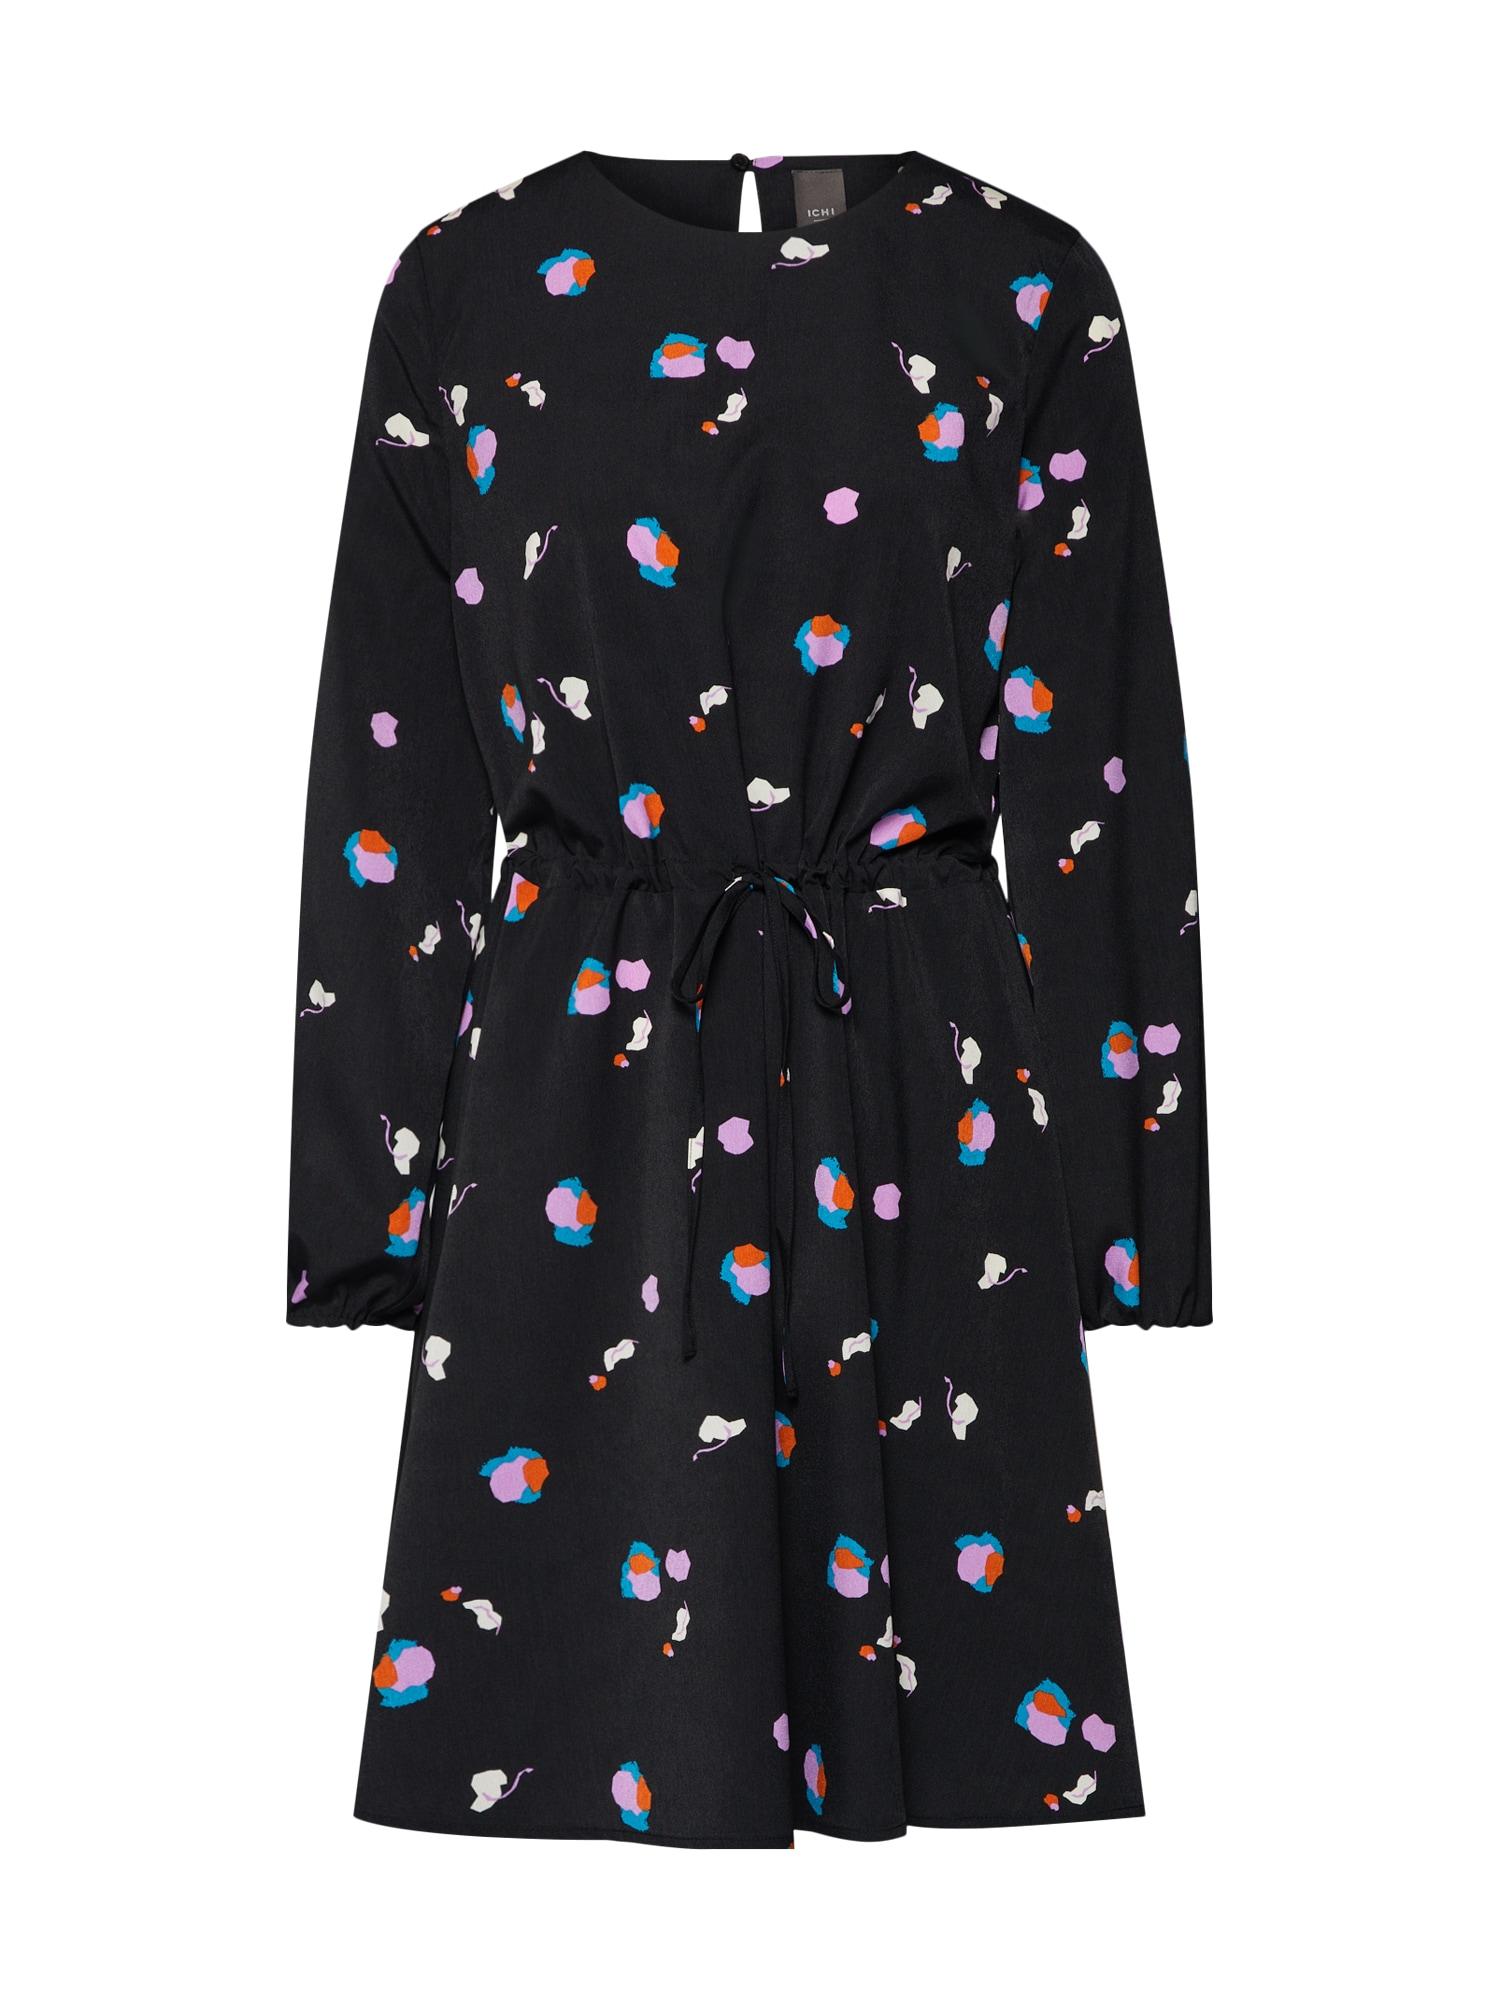 Šaty IXDAGNY mix barev černá ICHI